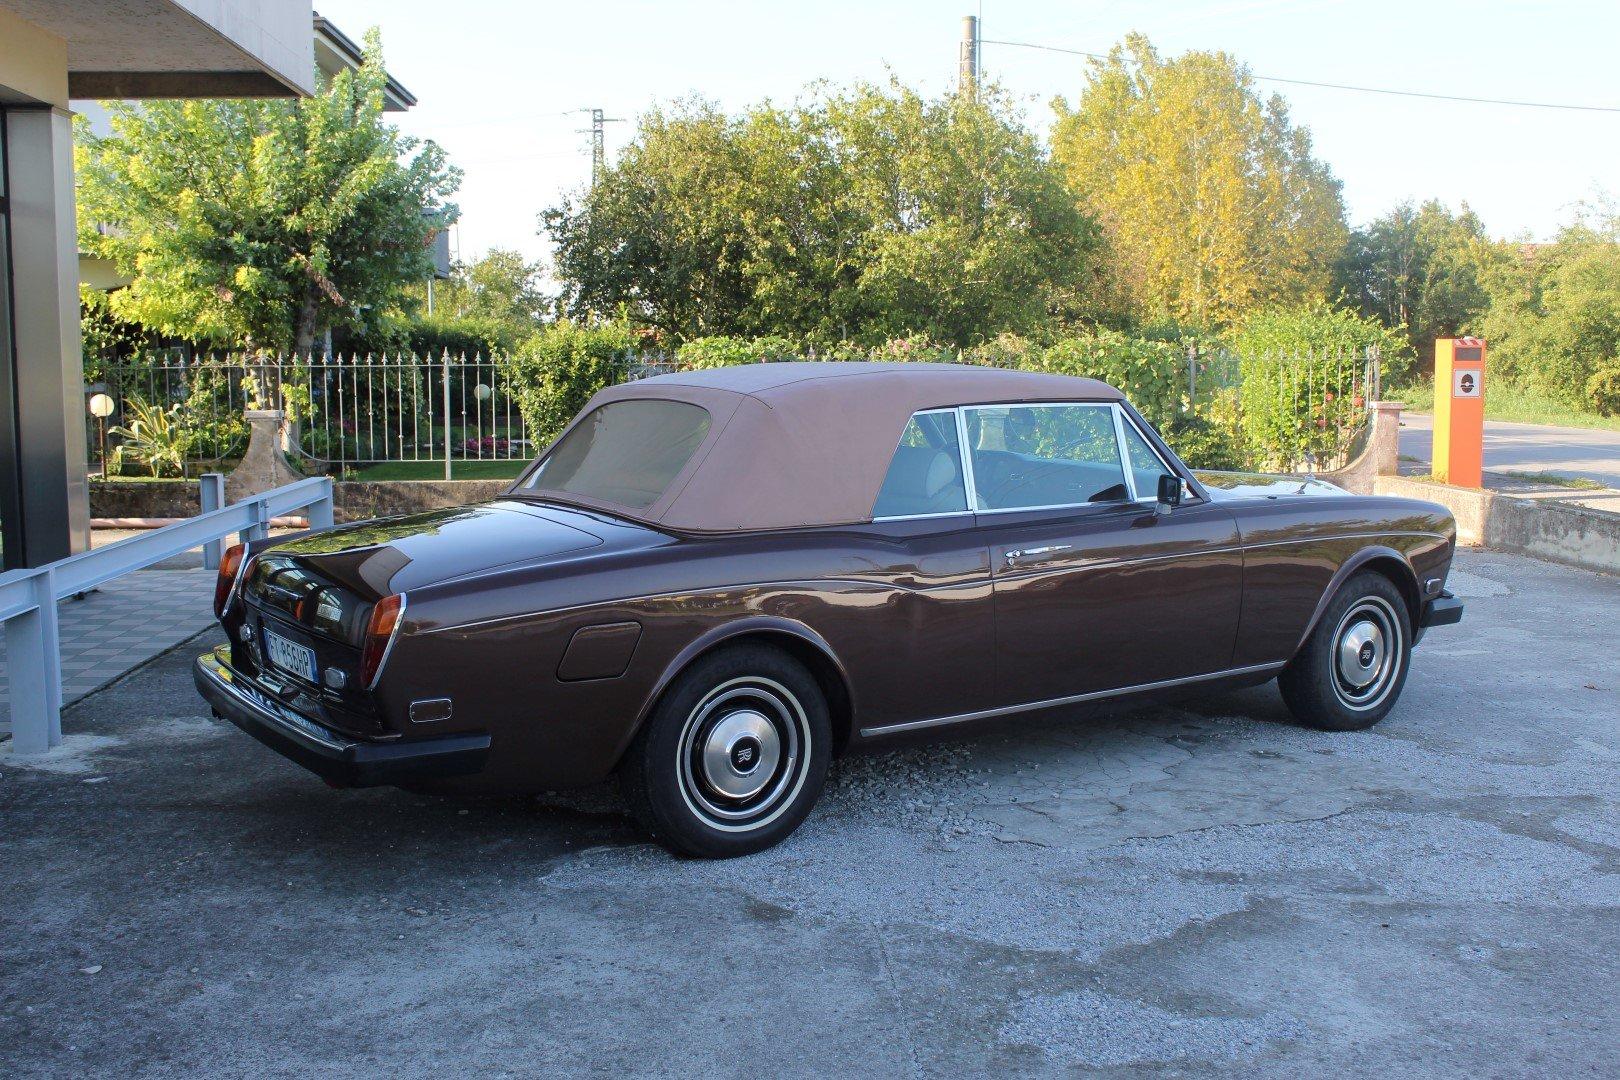 1977 Rolls royce corniche ii convertible lhd european For Sale (picture 3 of 6)